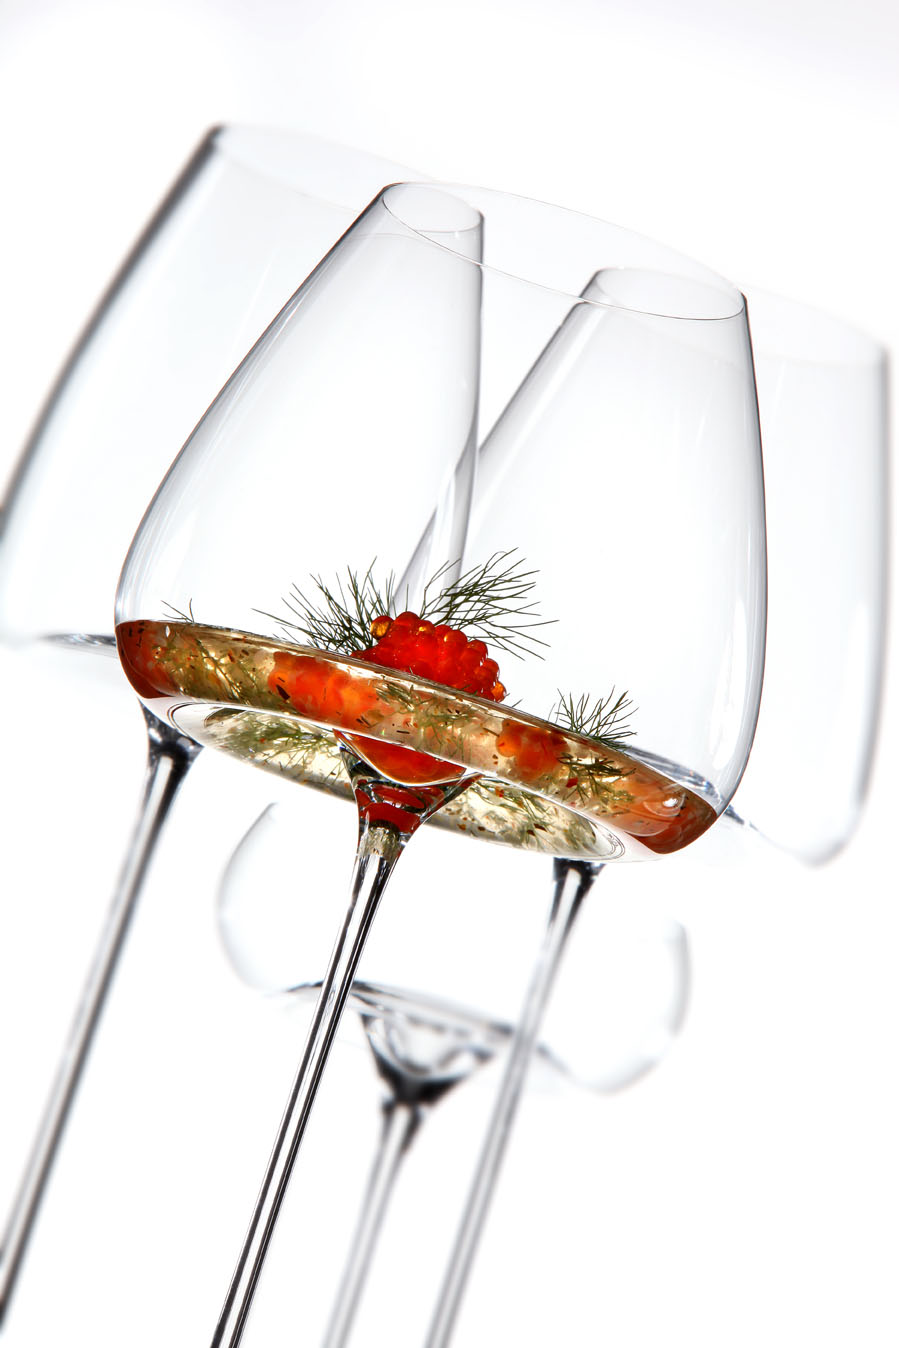 SF 5480x01 04 - Pahar pentru vin Balanced (5480.04PB) ZIEHER – Germania